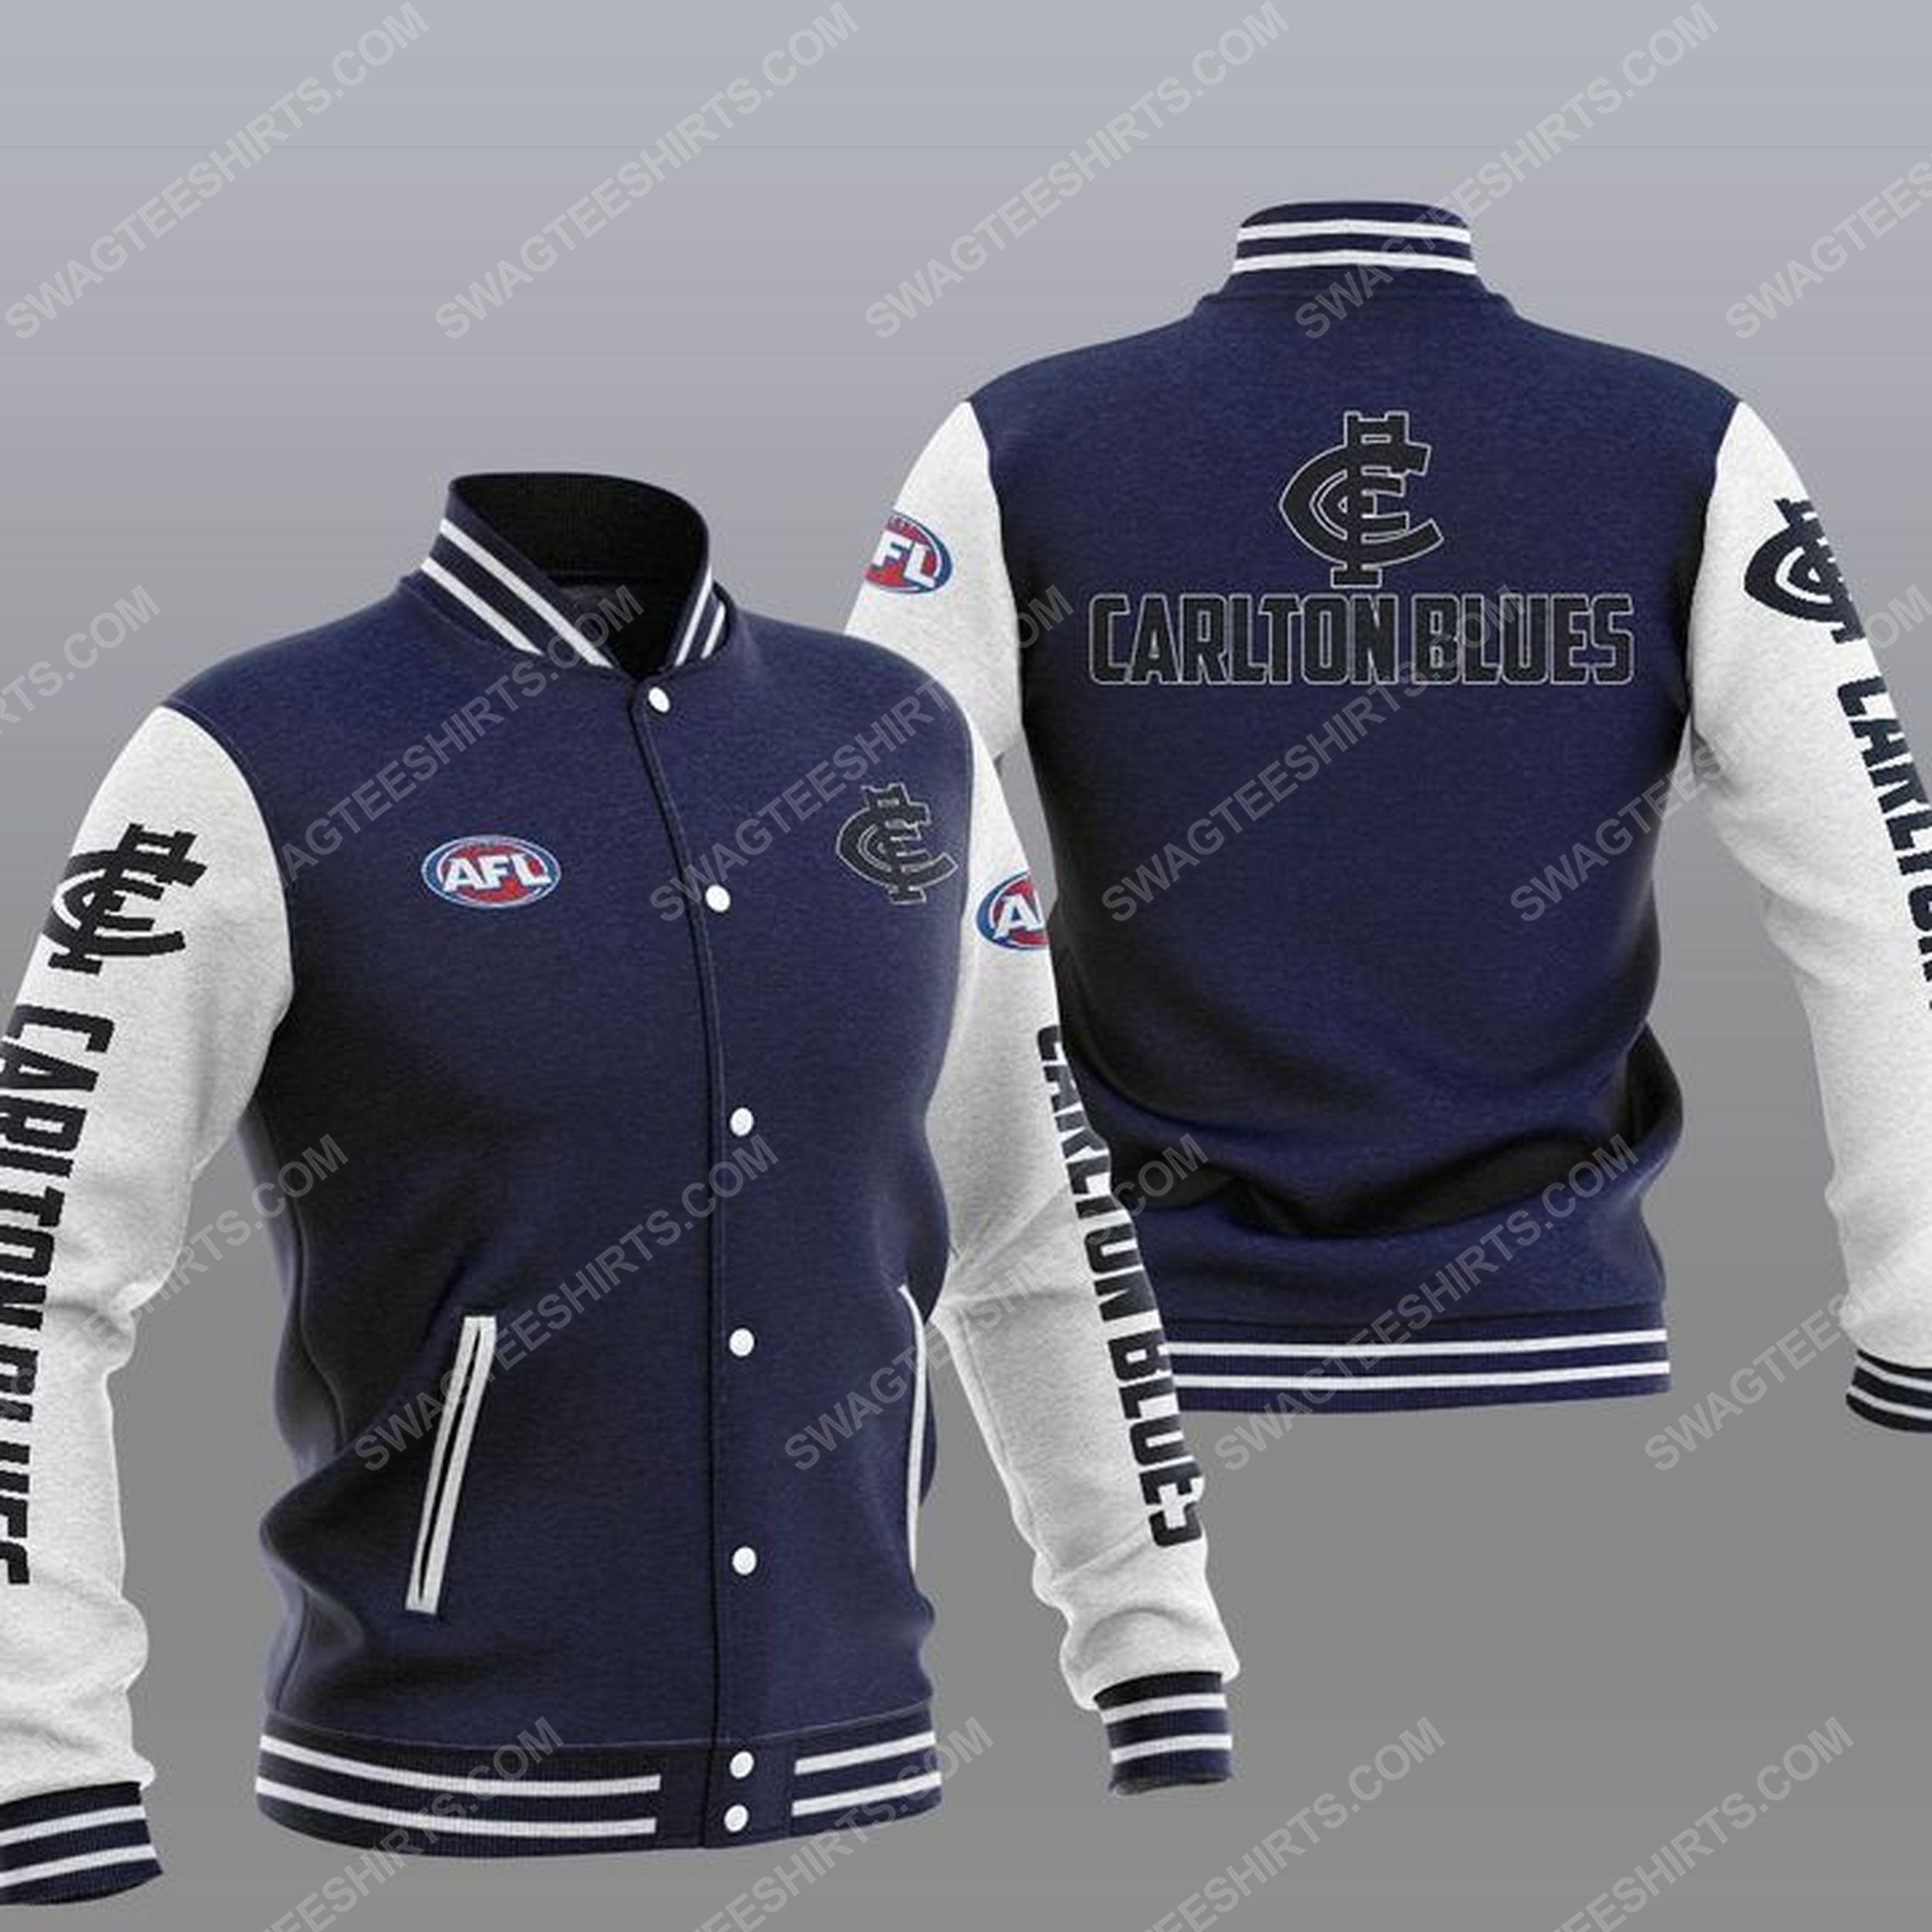 The carlton football club all over print baseball jacket - navy 1